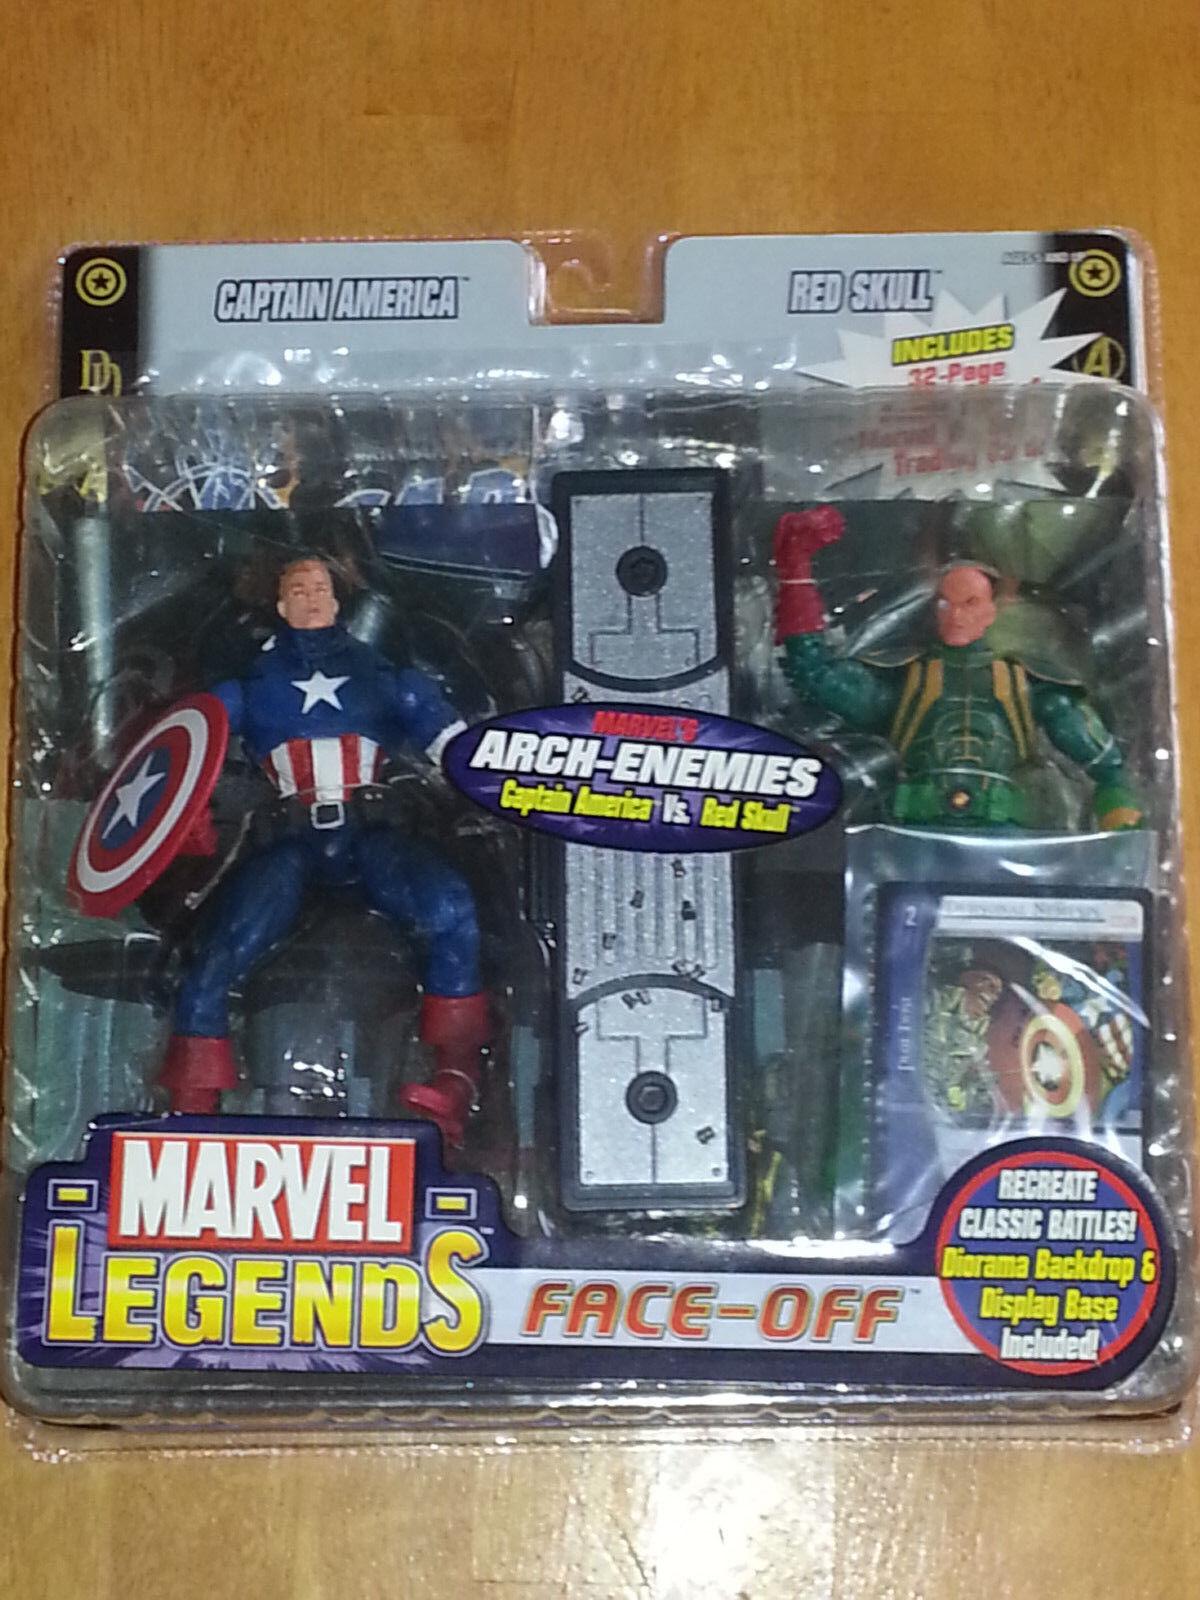 Marvel Leyendas Nuevo-Face Off-Capitán América Vs Barón Strucker Variante